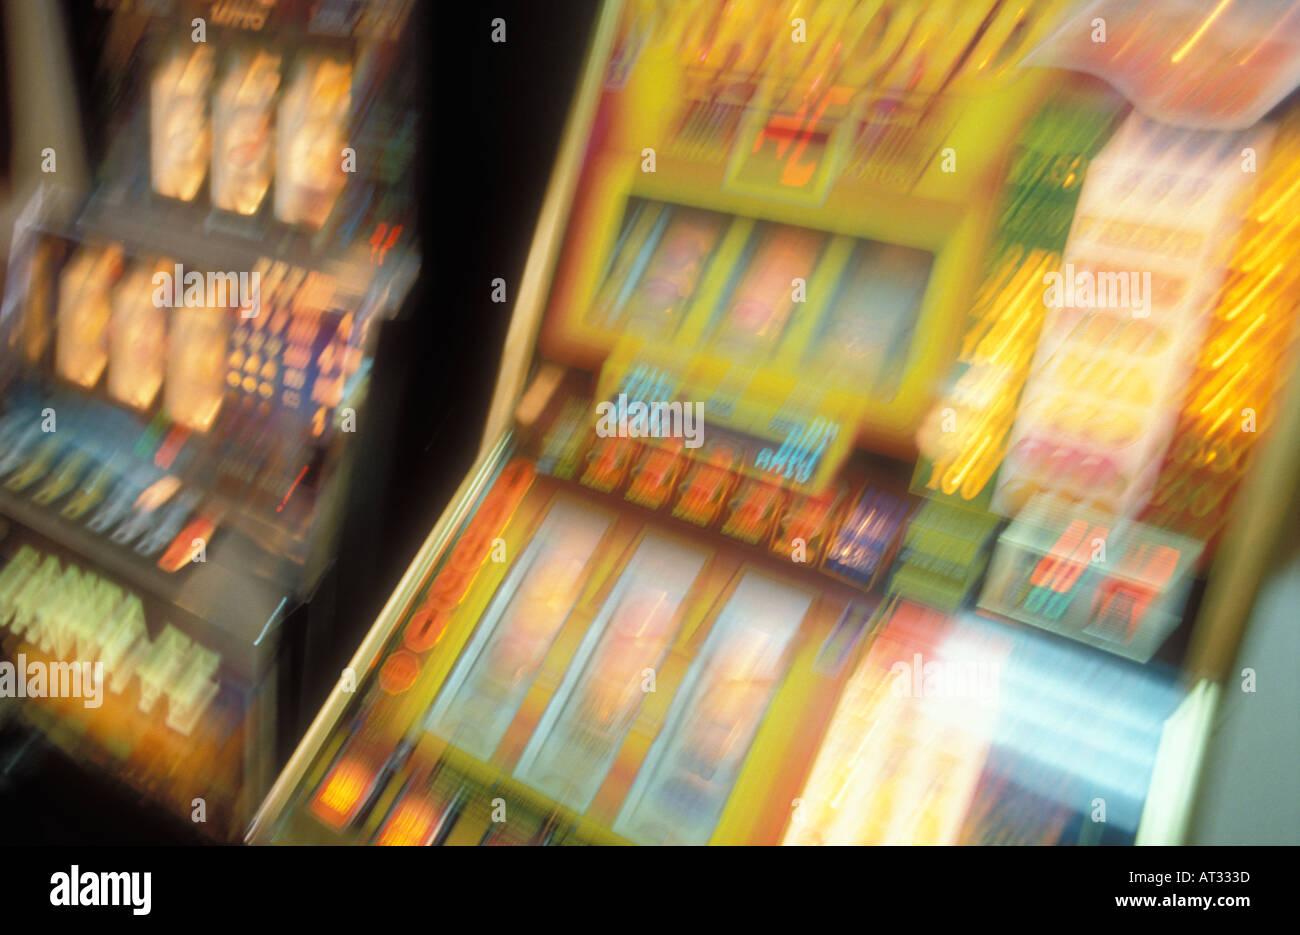 Arcade Money Machine Lucky Luck Random Two Moved Exposure Blurred